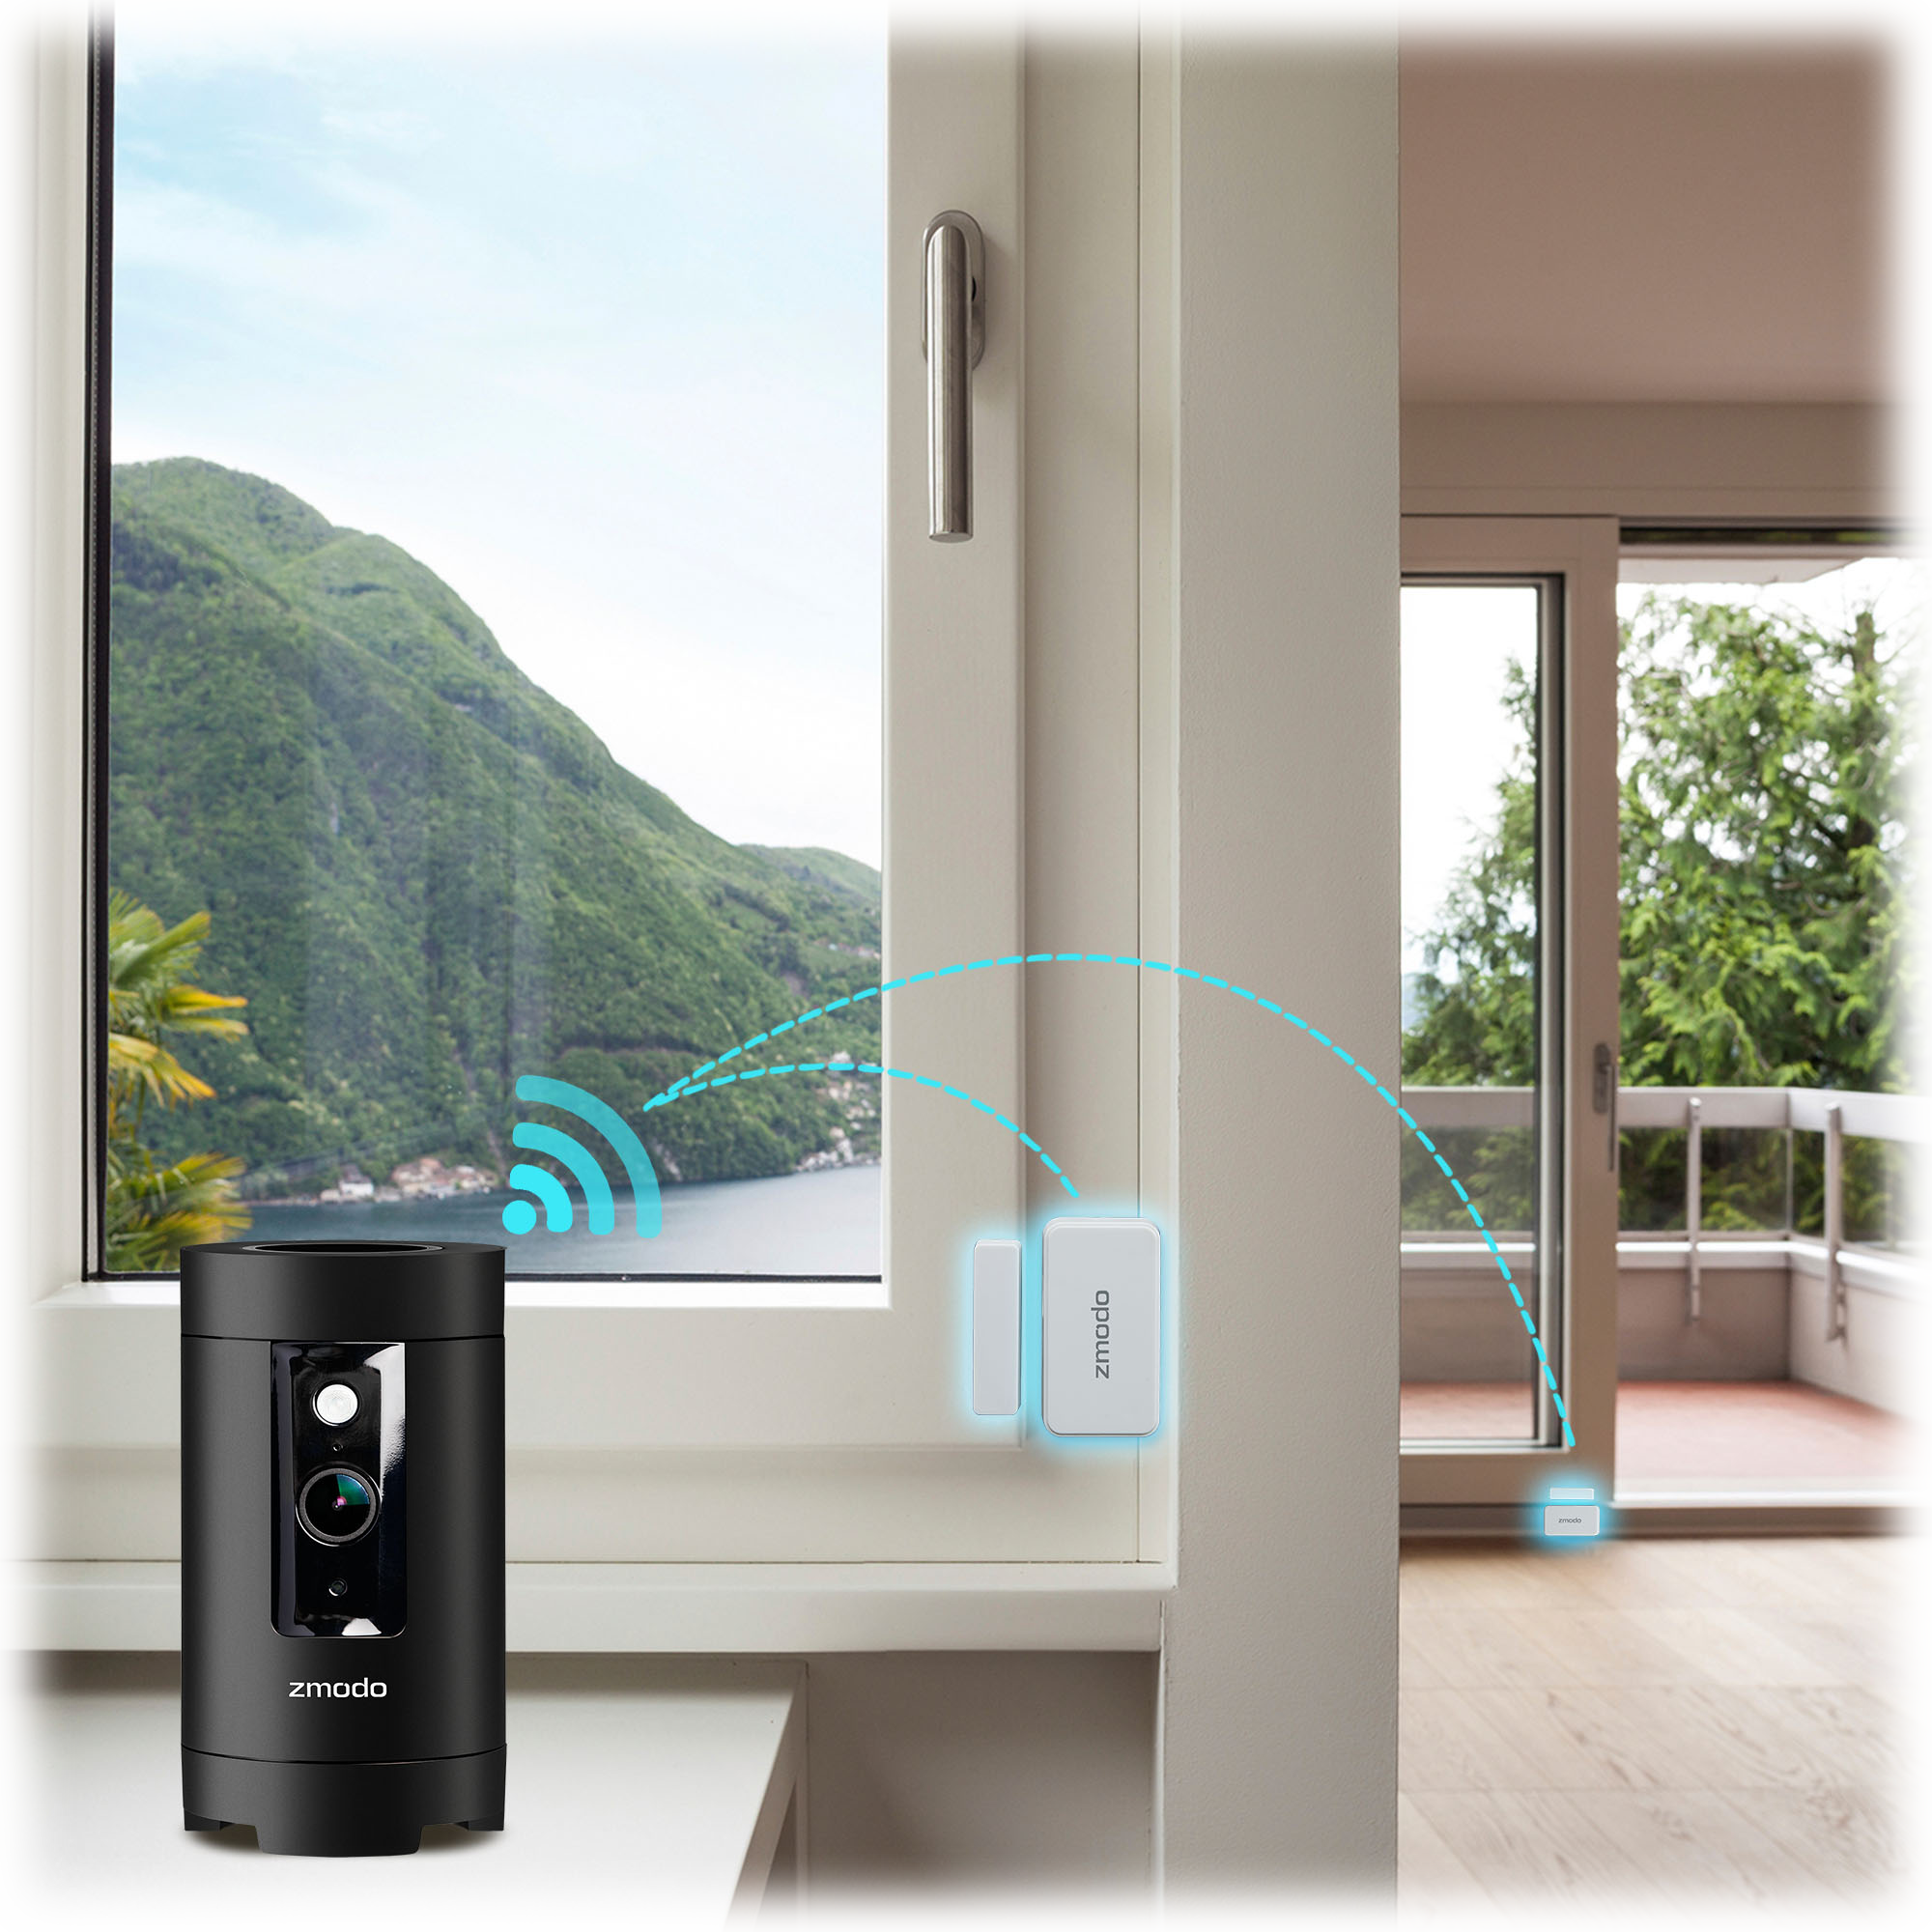 Zmodo Pivot 1080p 360° WiFi Camera With Smarthub And